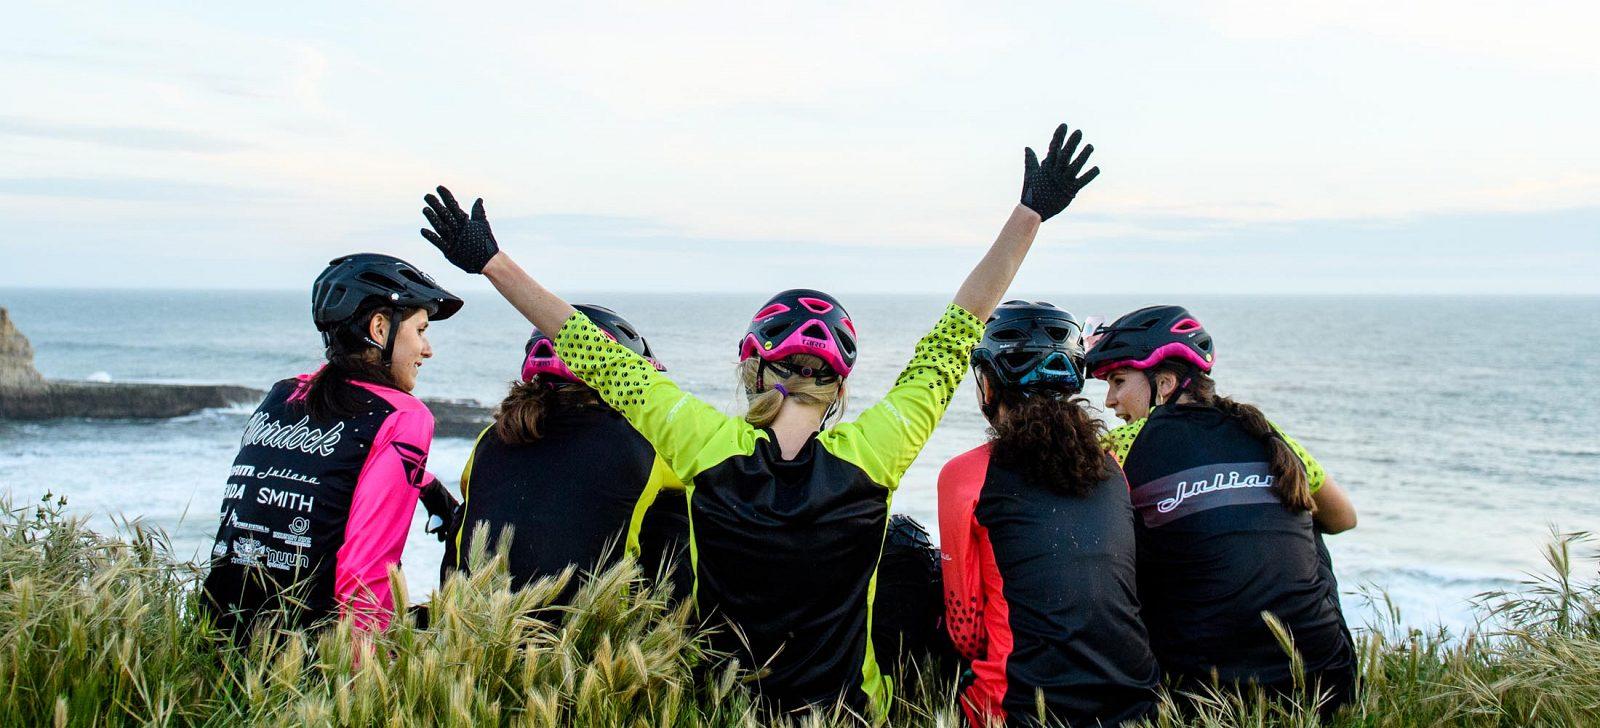 Juliana Bicycles - Careers and Job Openings at Juliana